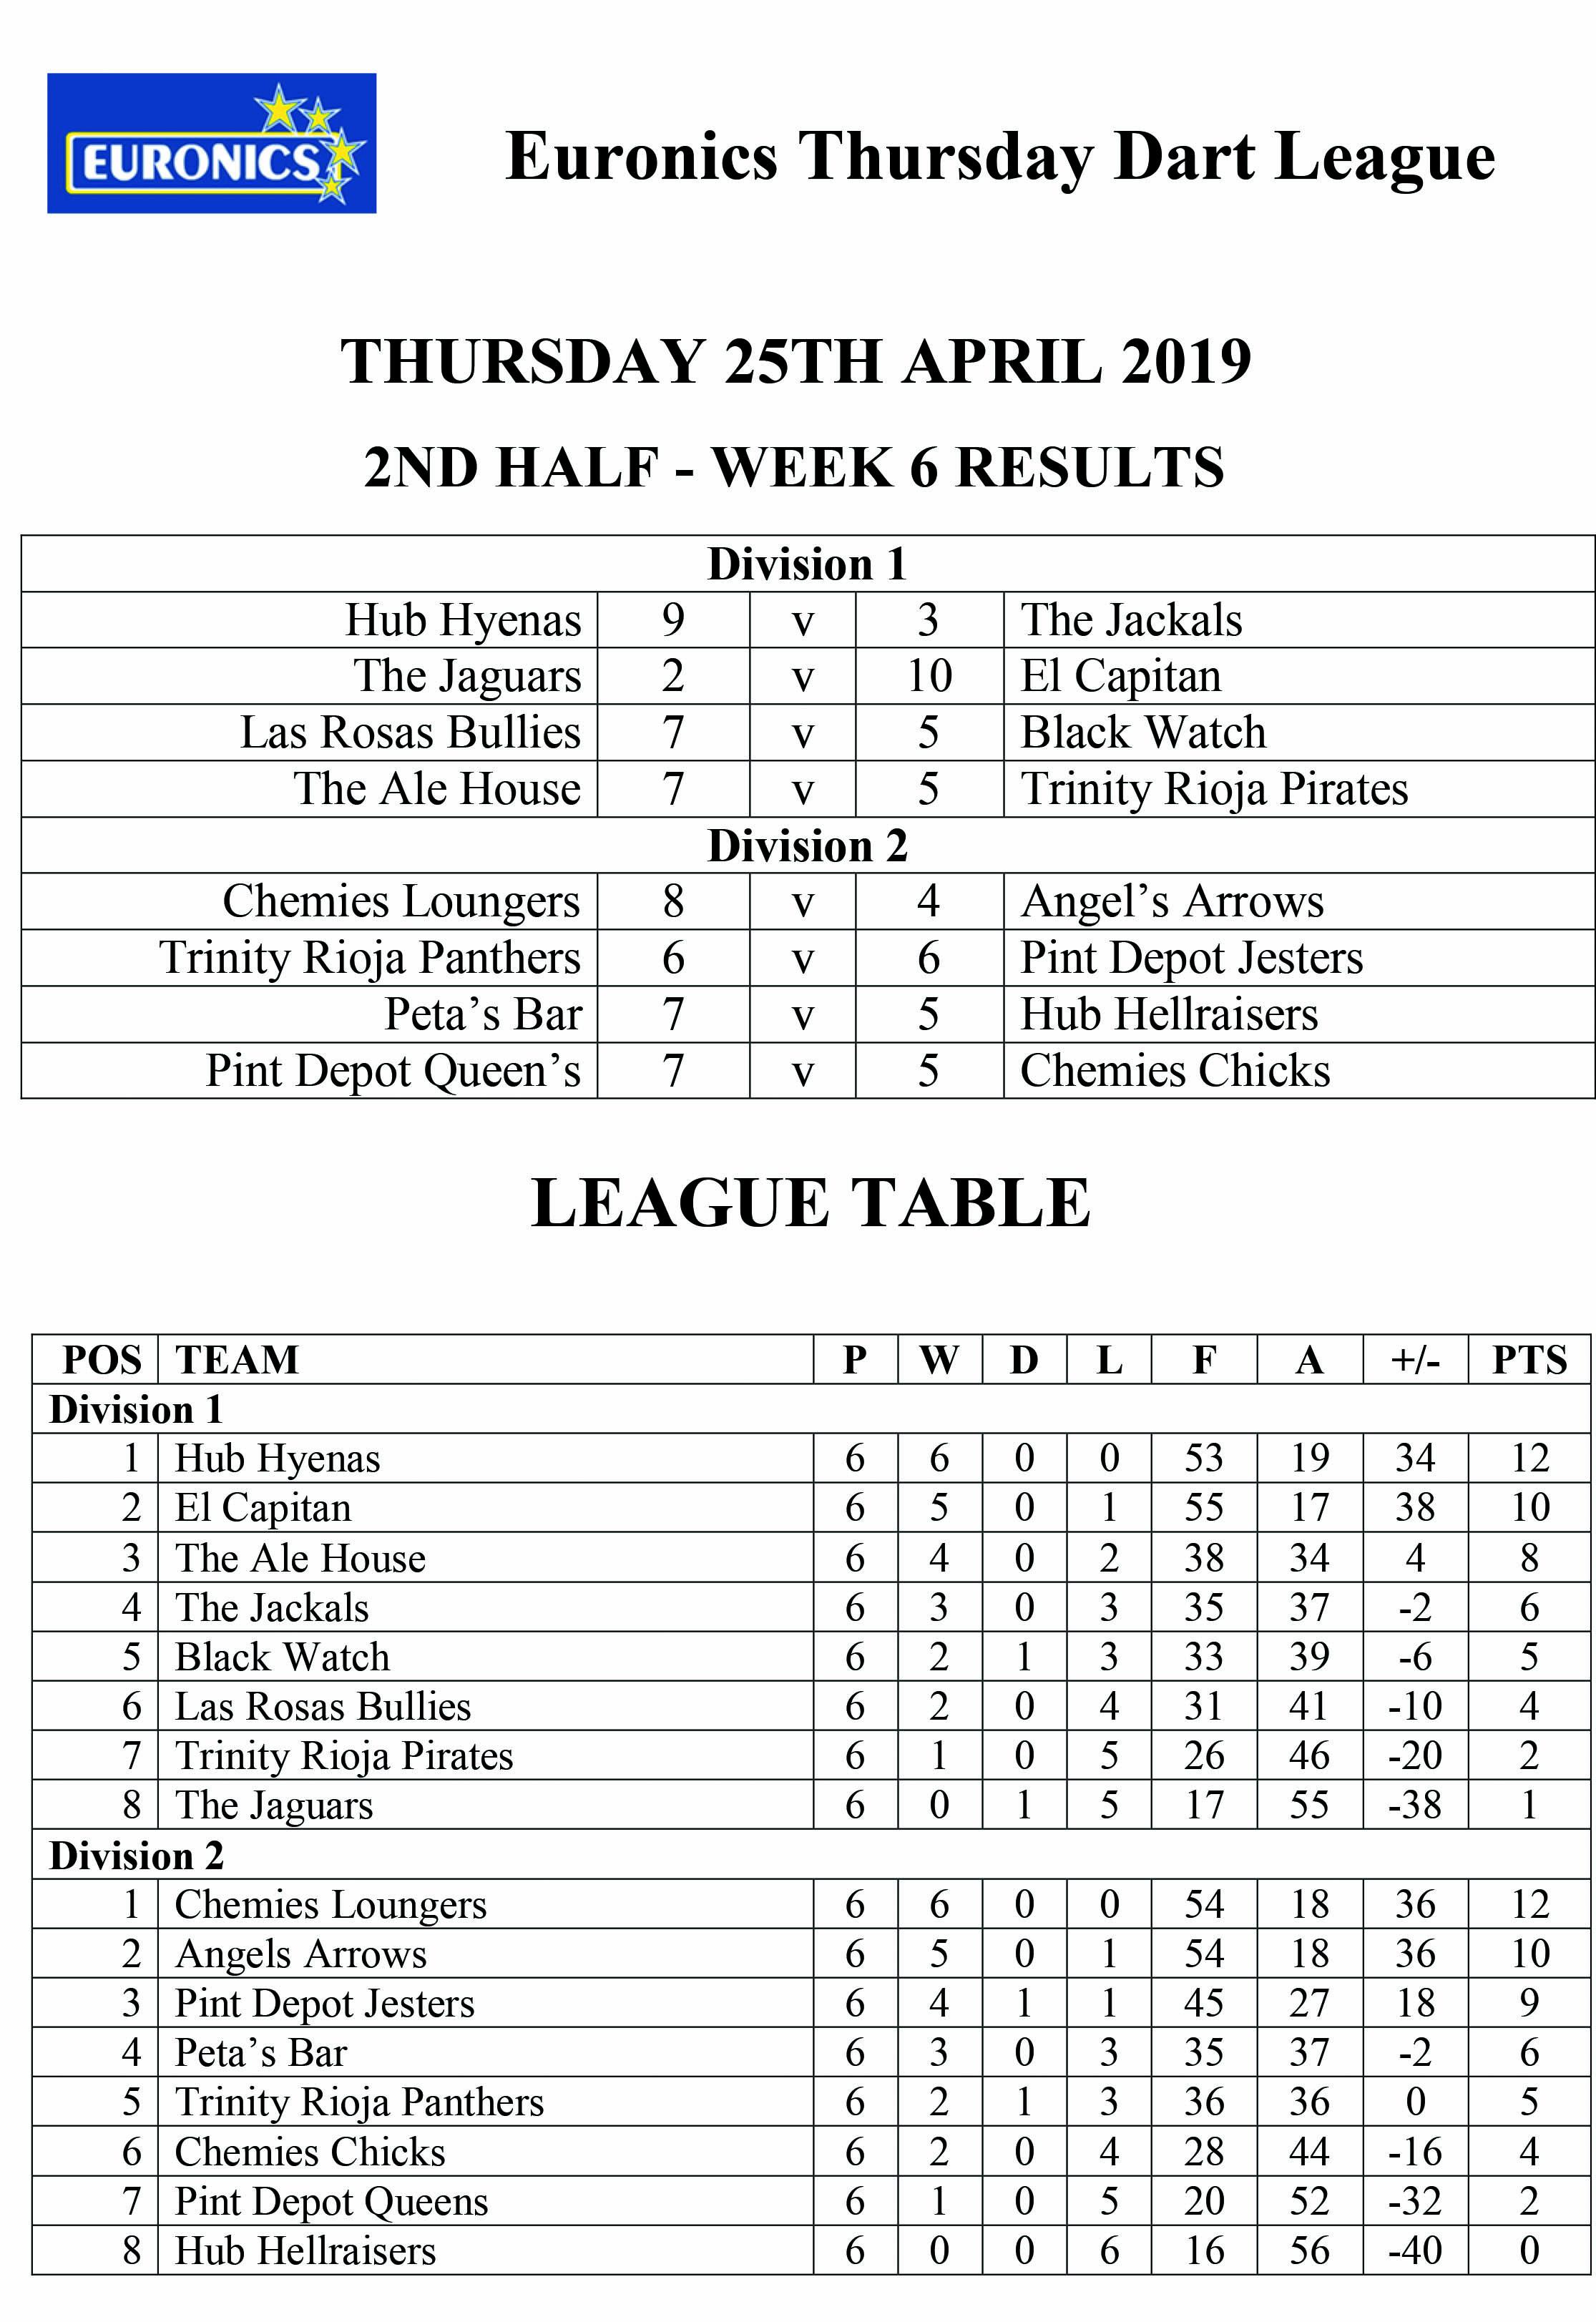 League Table 2nd Half Week 6